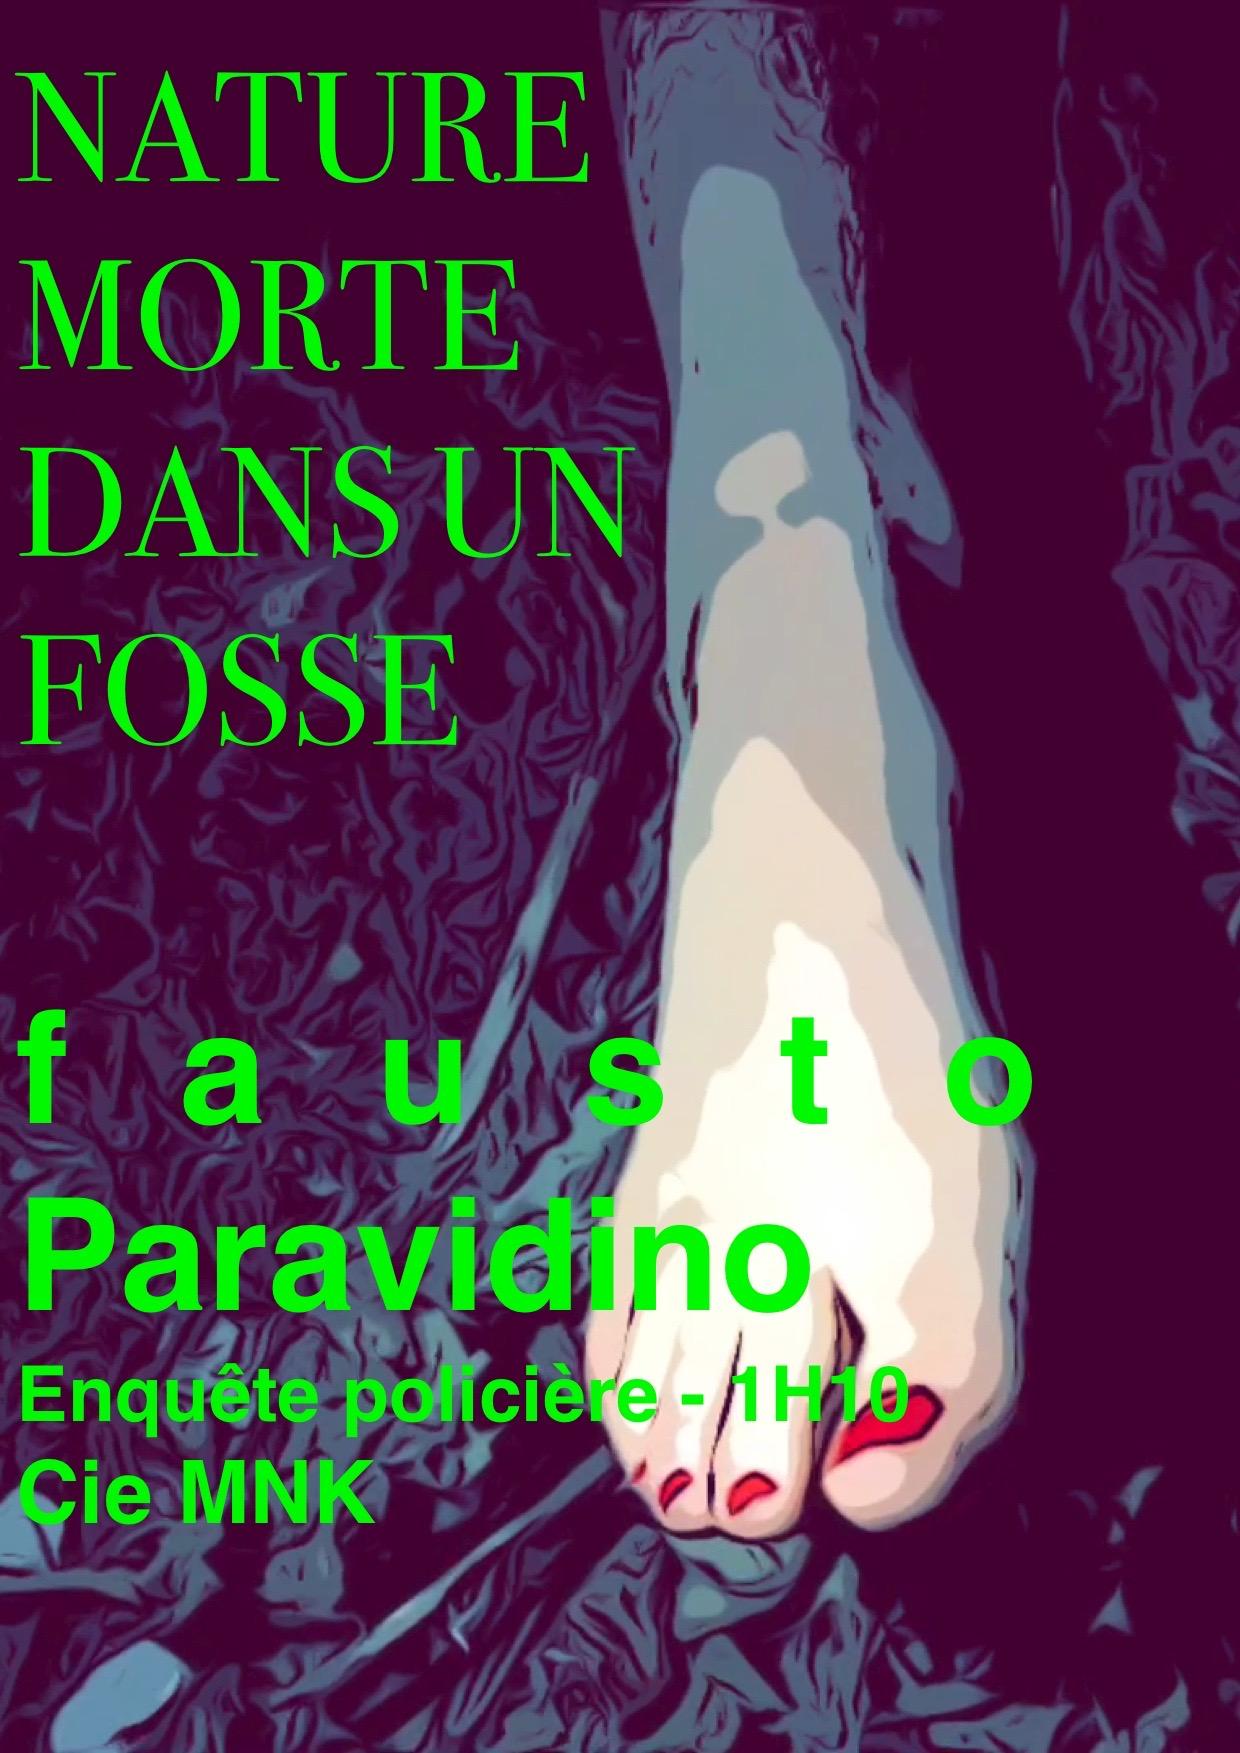 NATURE MORTE  de Fausto Paravidino  -  Polar - Compagnie MNK